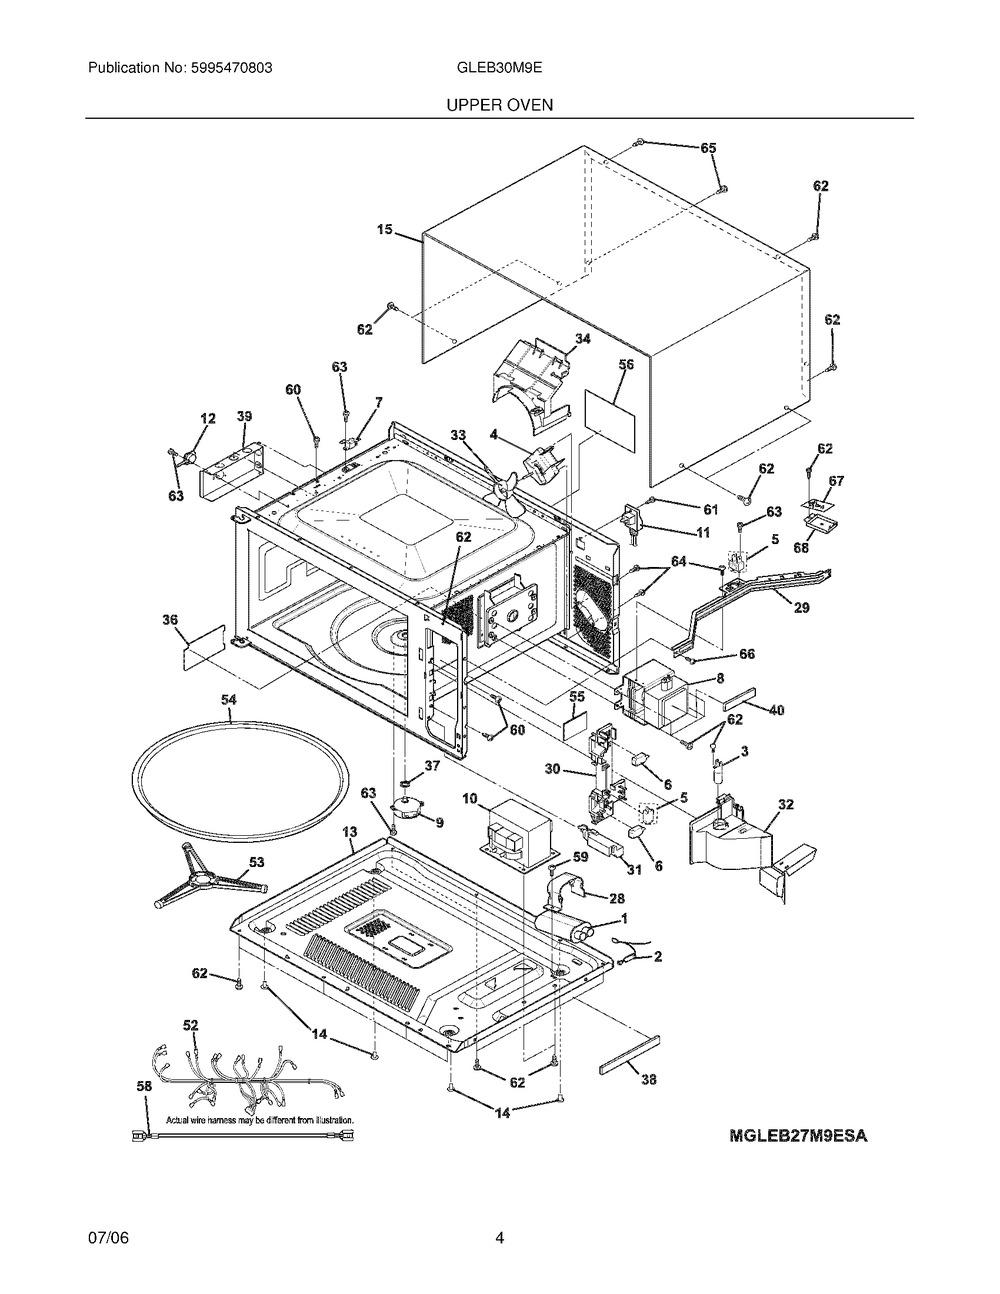 Diagram for GLEB30M9EQC